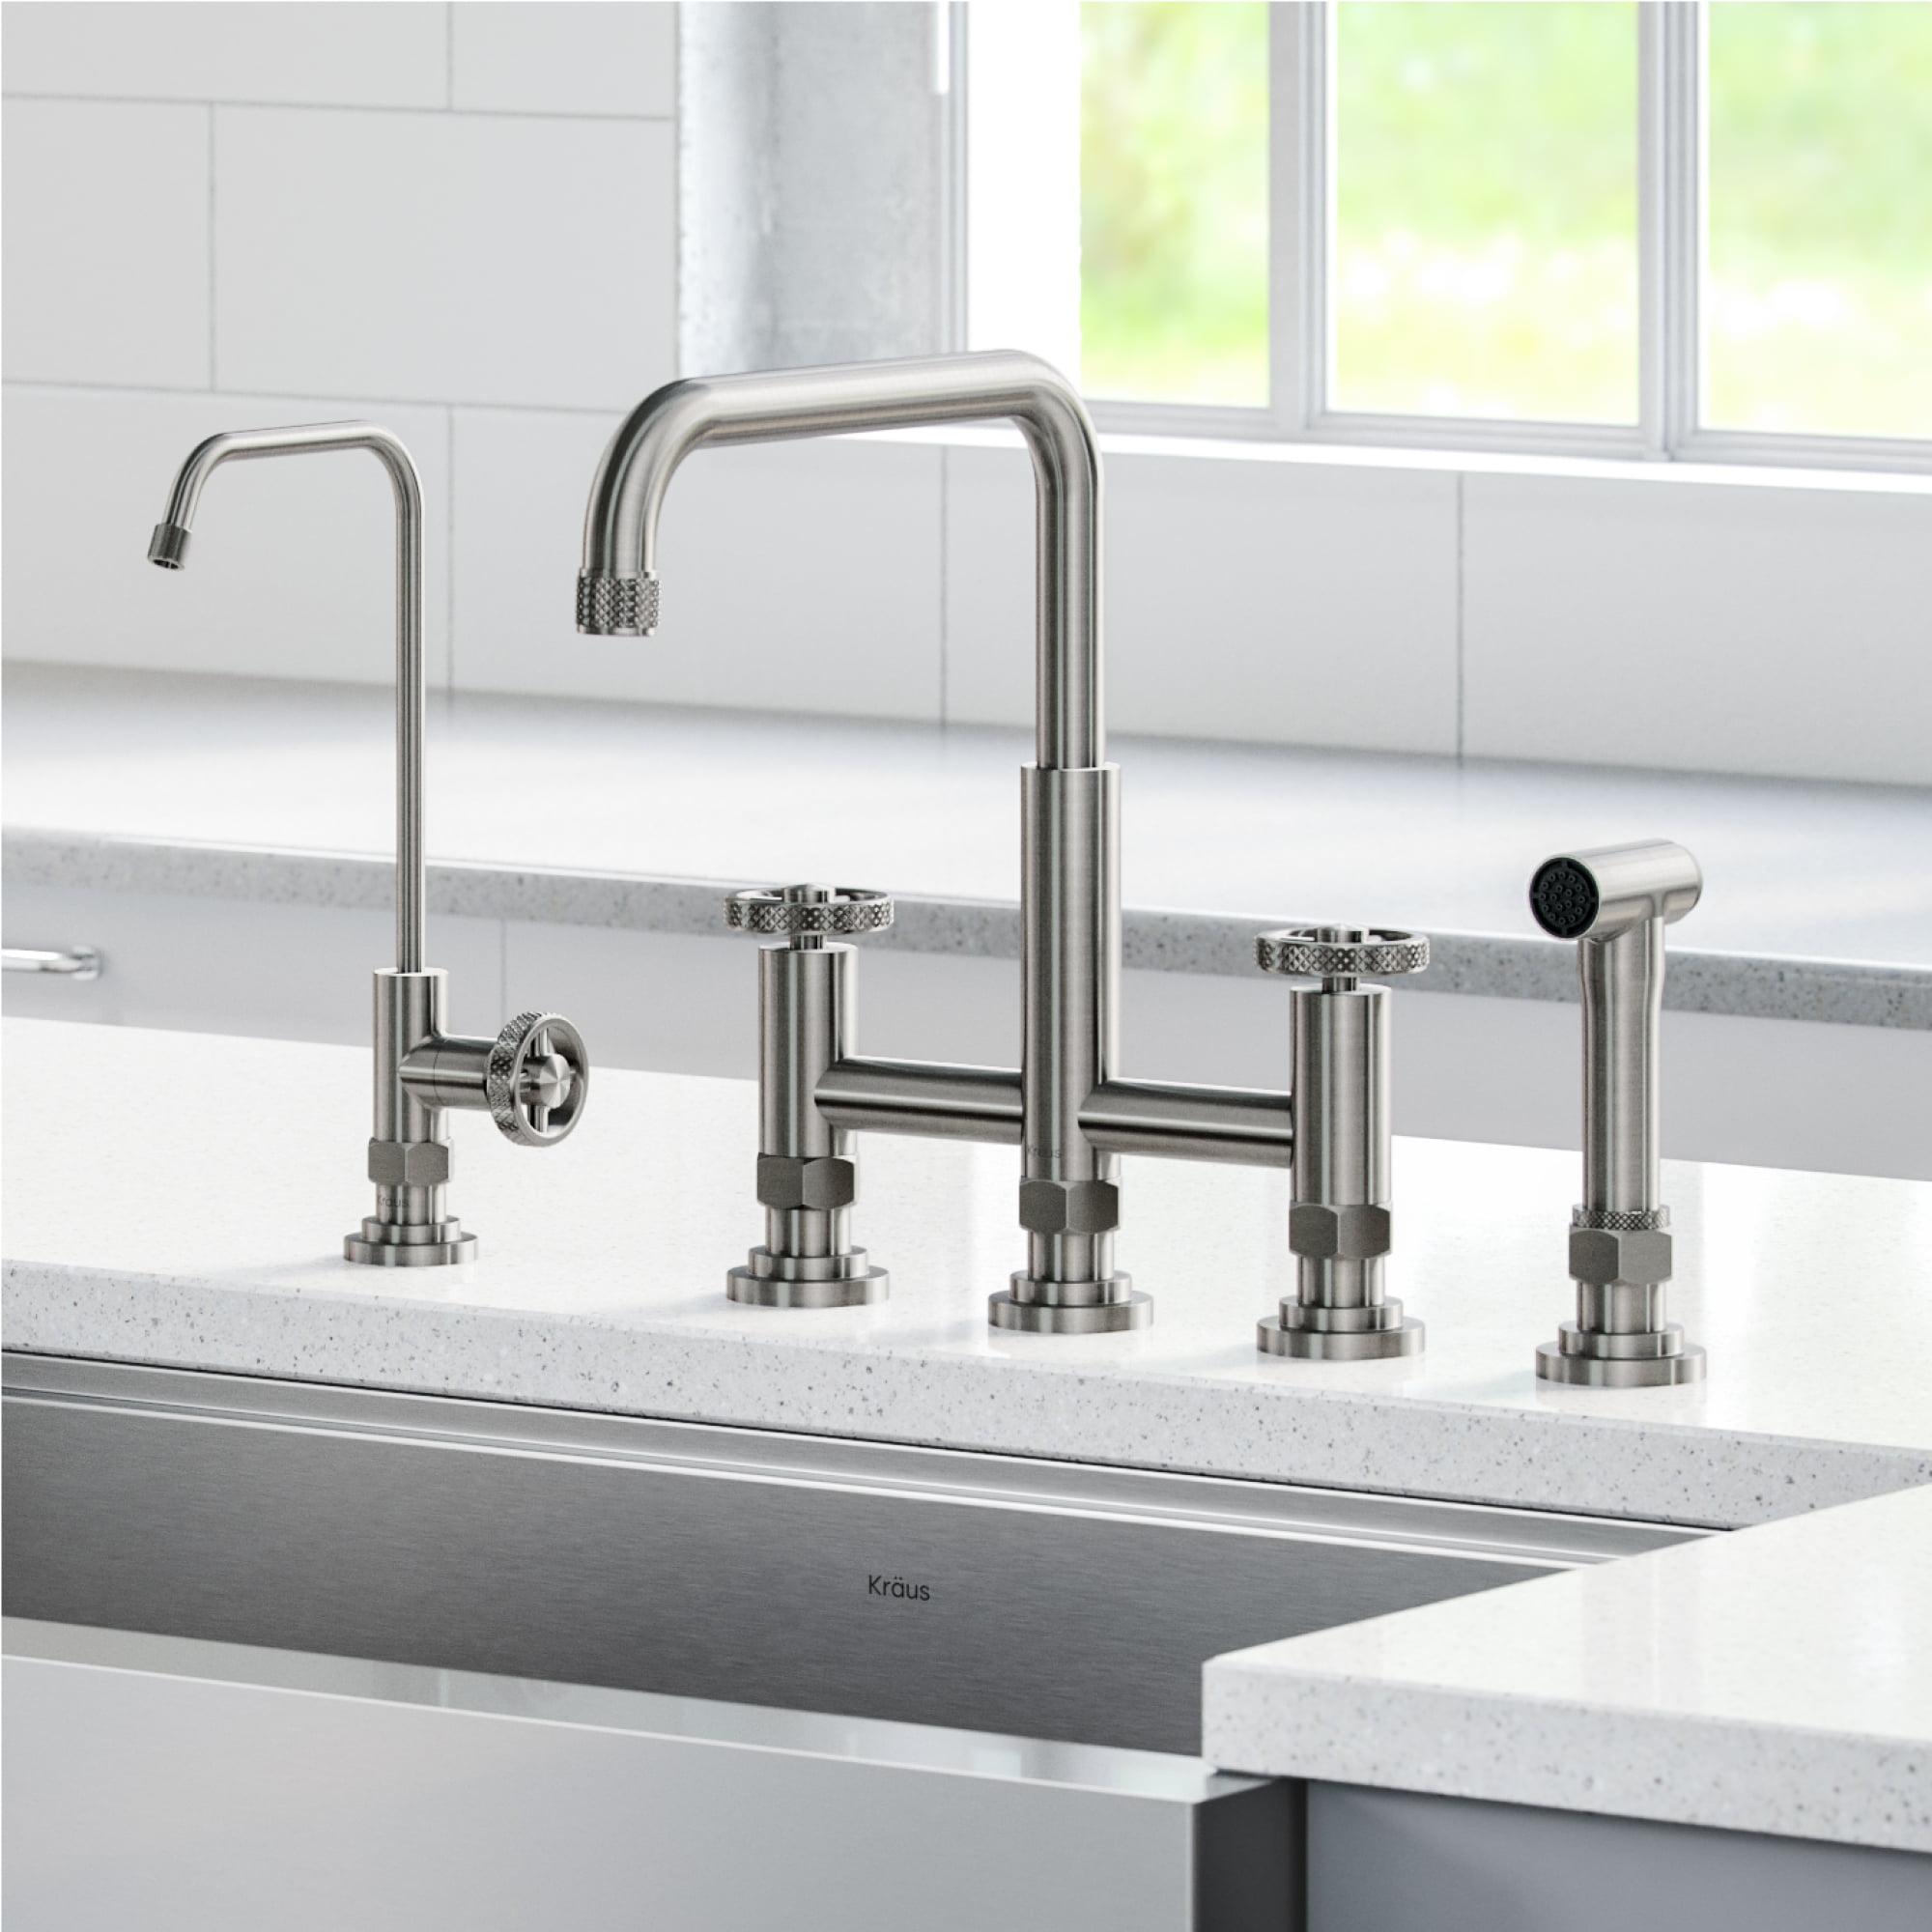 Kraus Urbix Industrial Bridge Kitchen Faucet And Water Filter Faucet Combo In Spot Free Stainless Steel Walmart Com Walmart Com